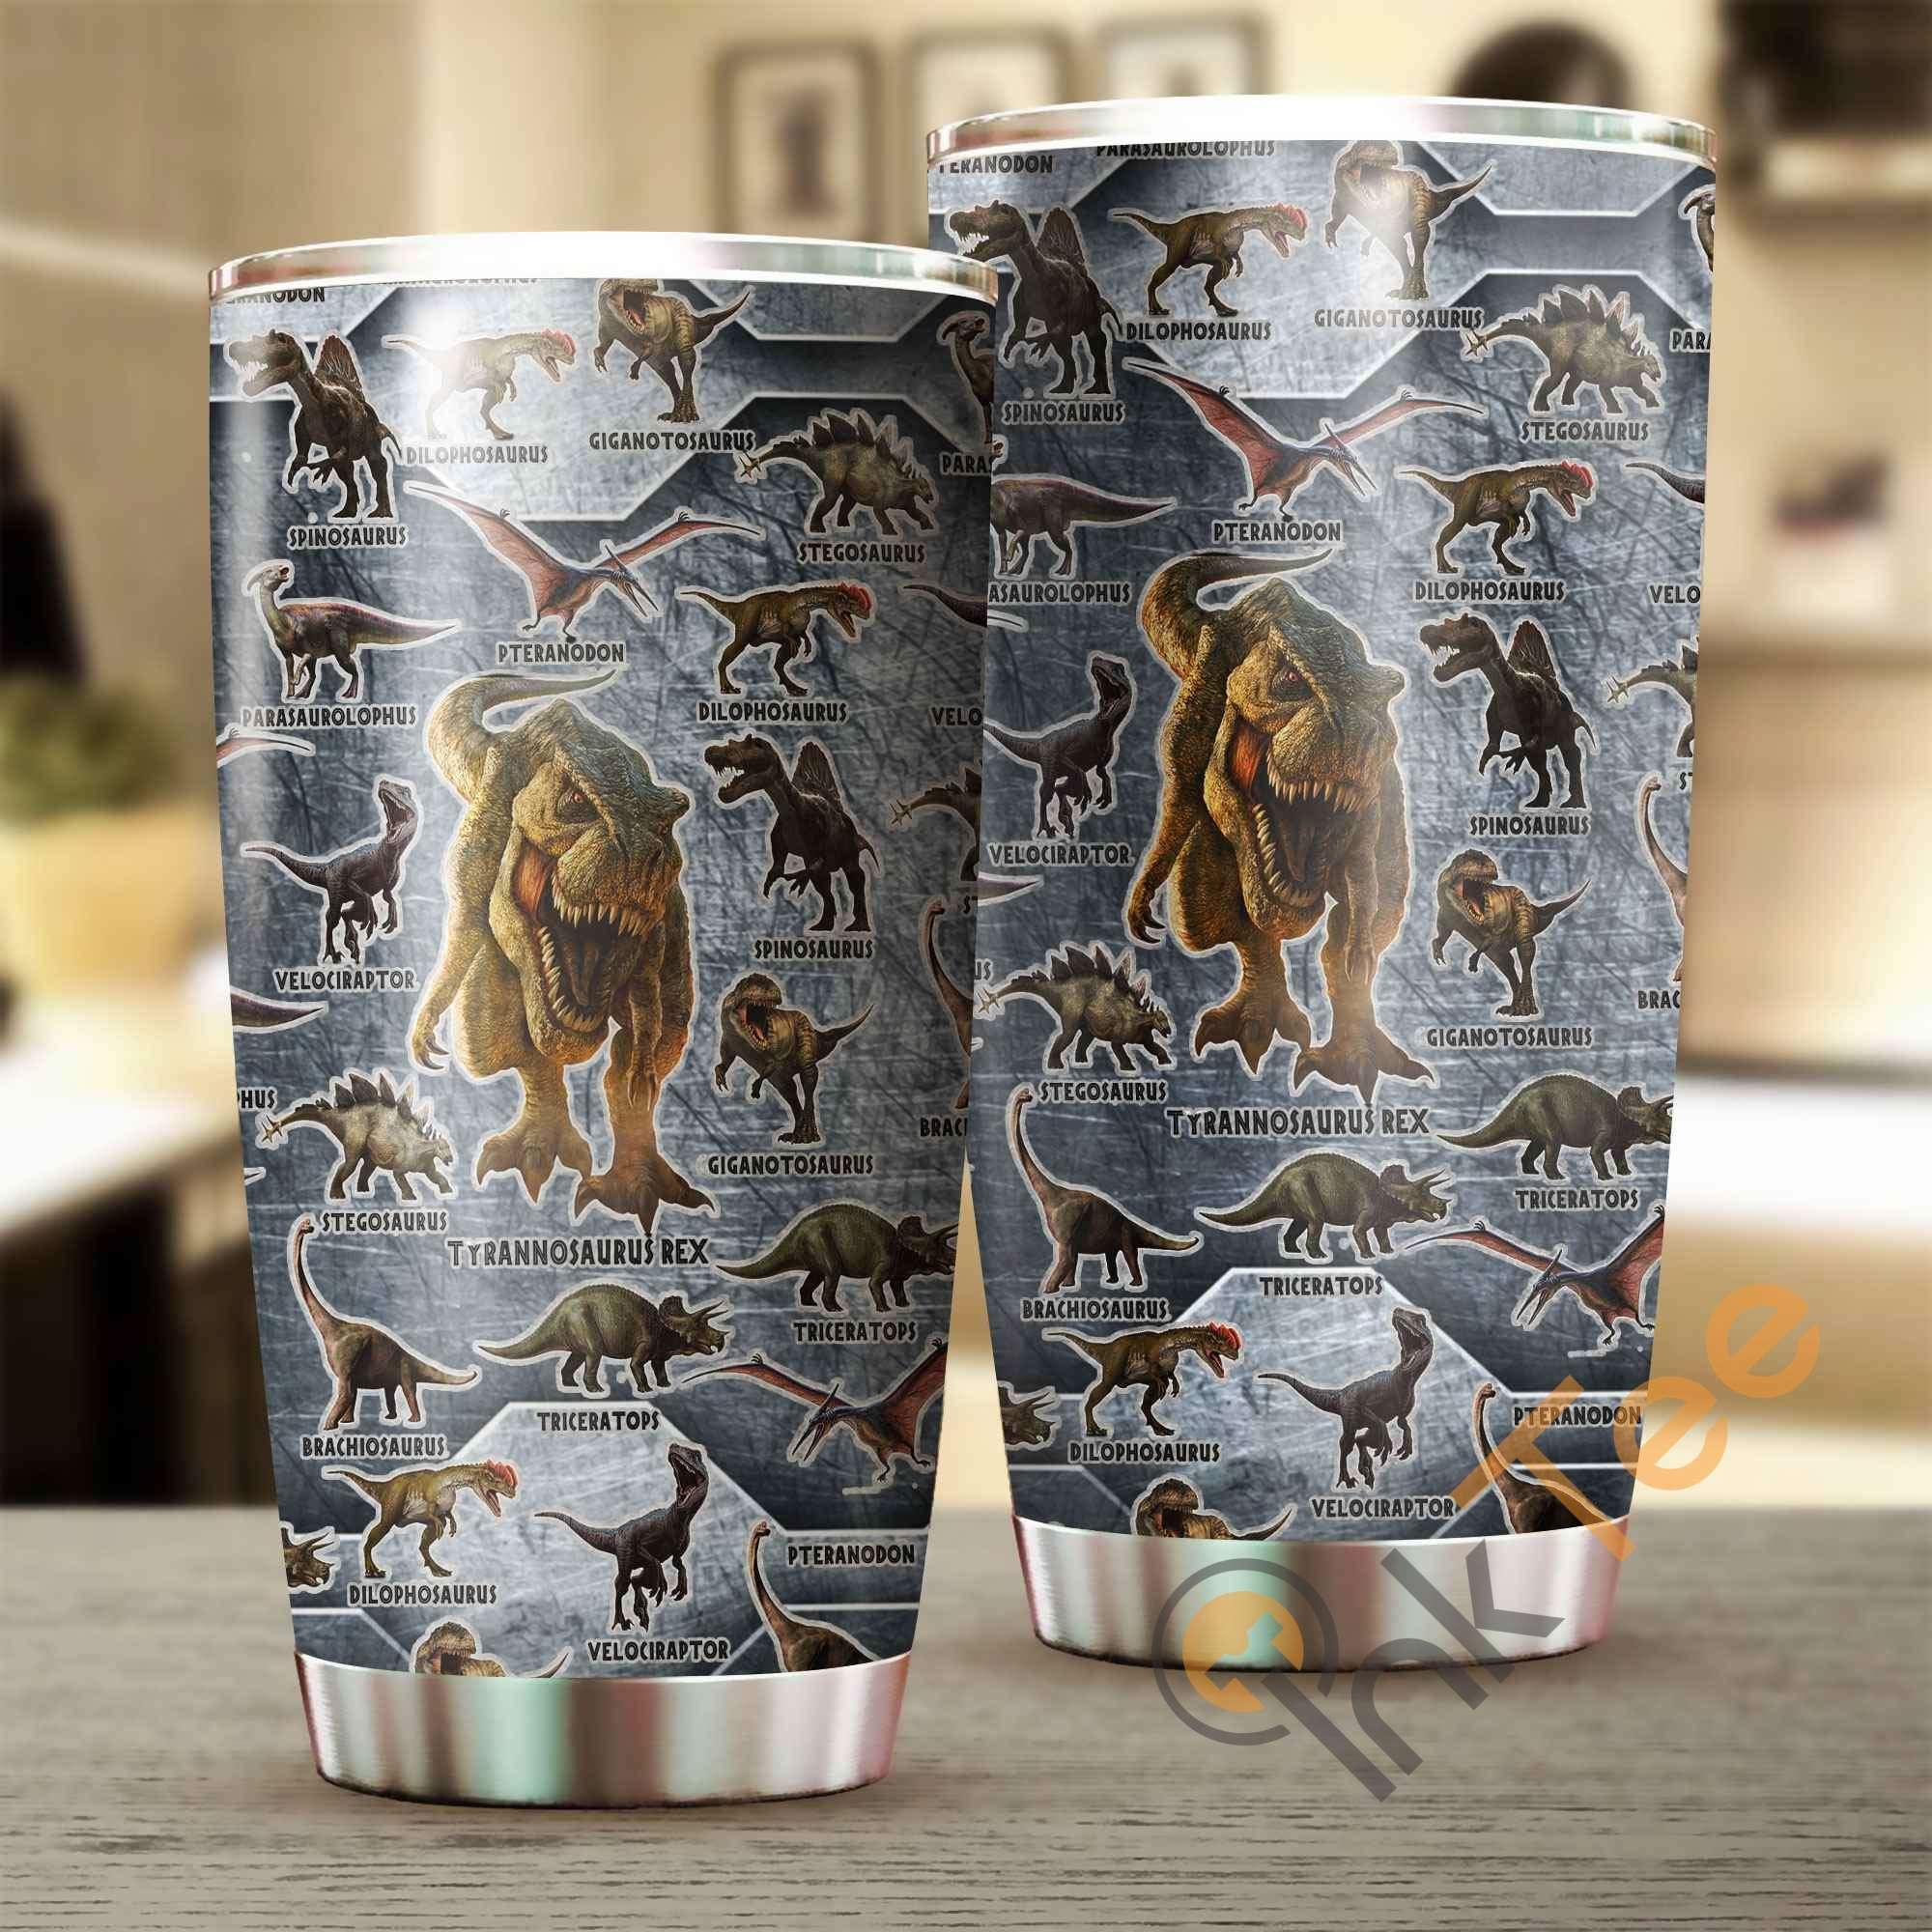 Love Dinosaurs Amazon Best Seller Sku 3401 Stainless Steel Tumbler